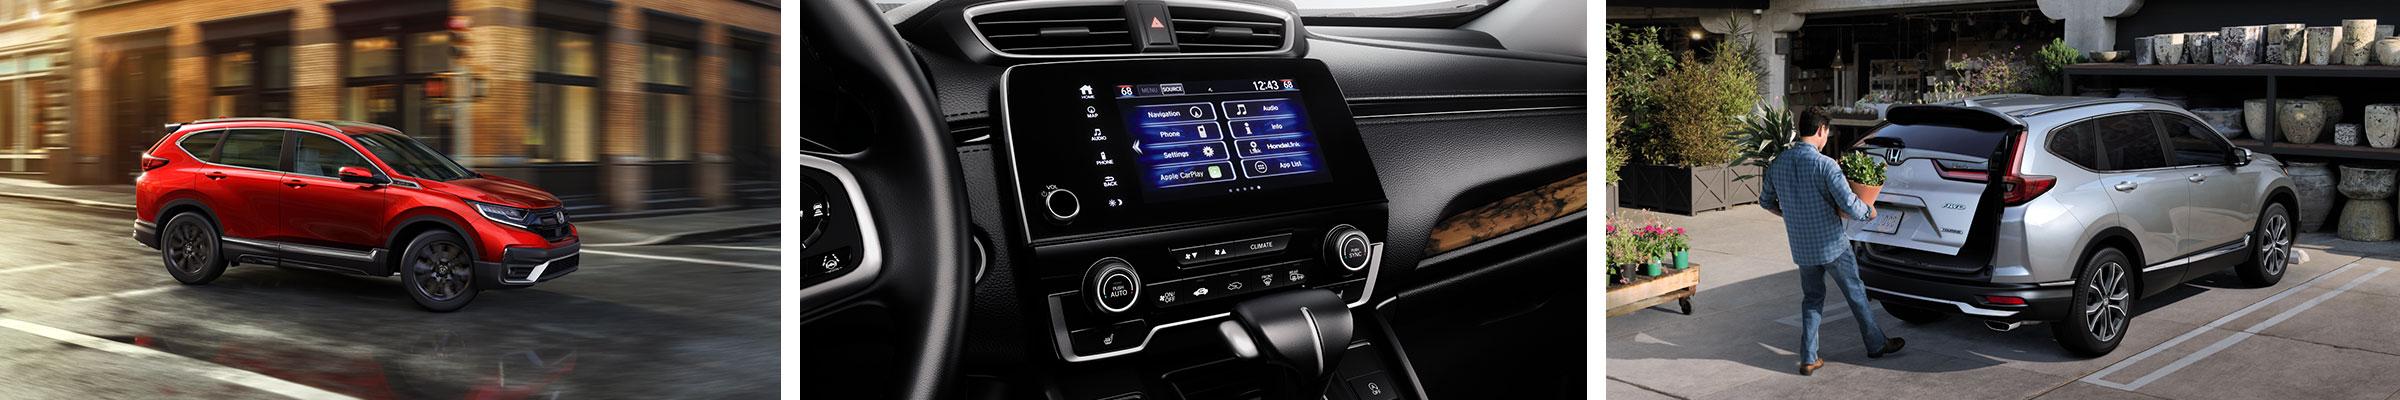 2021 Honda CR-V For Sale Venice FL | North Port